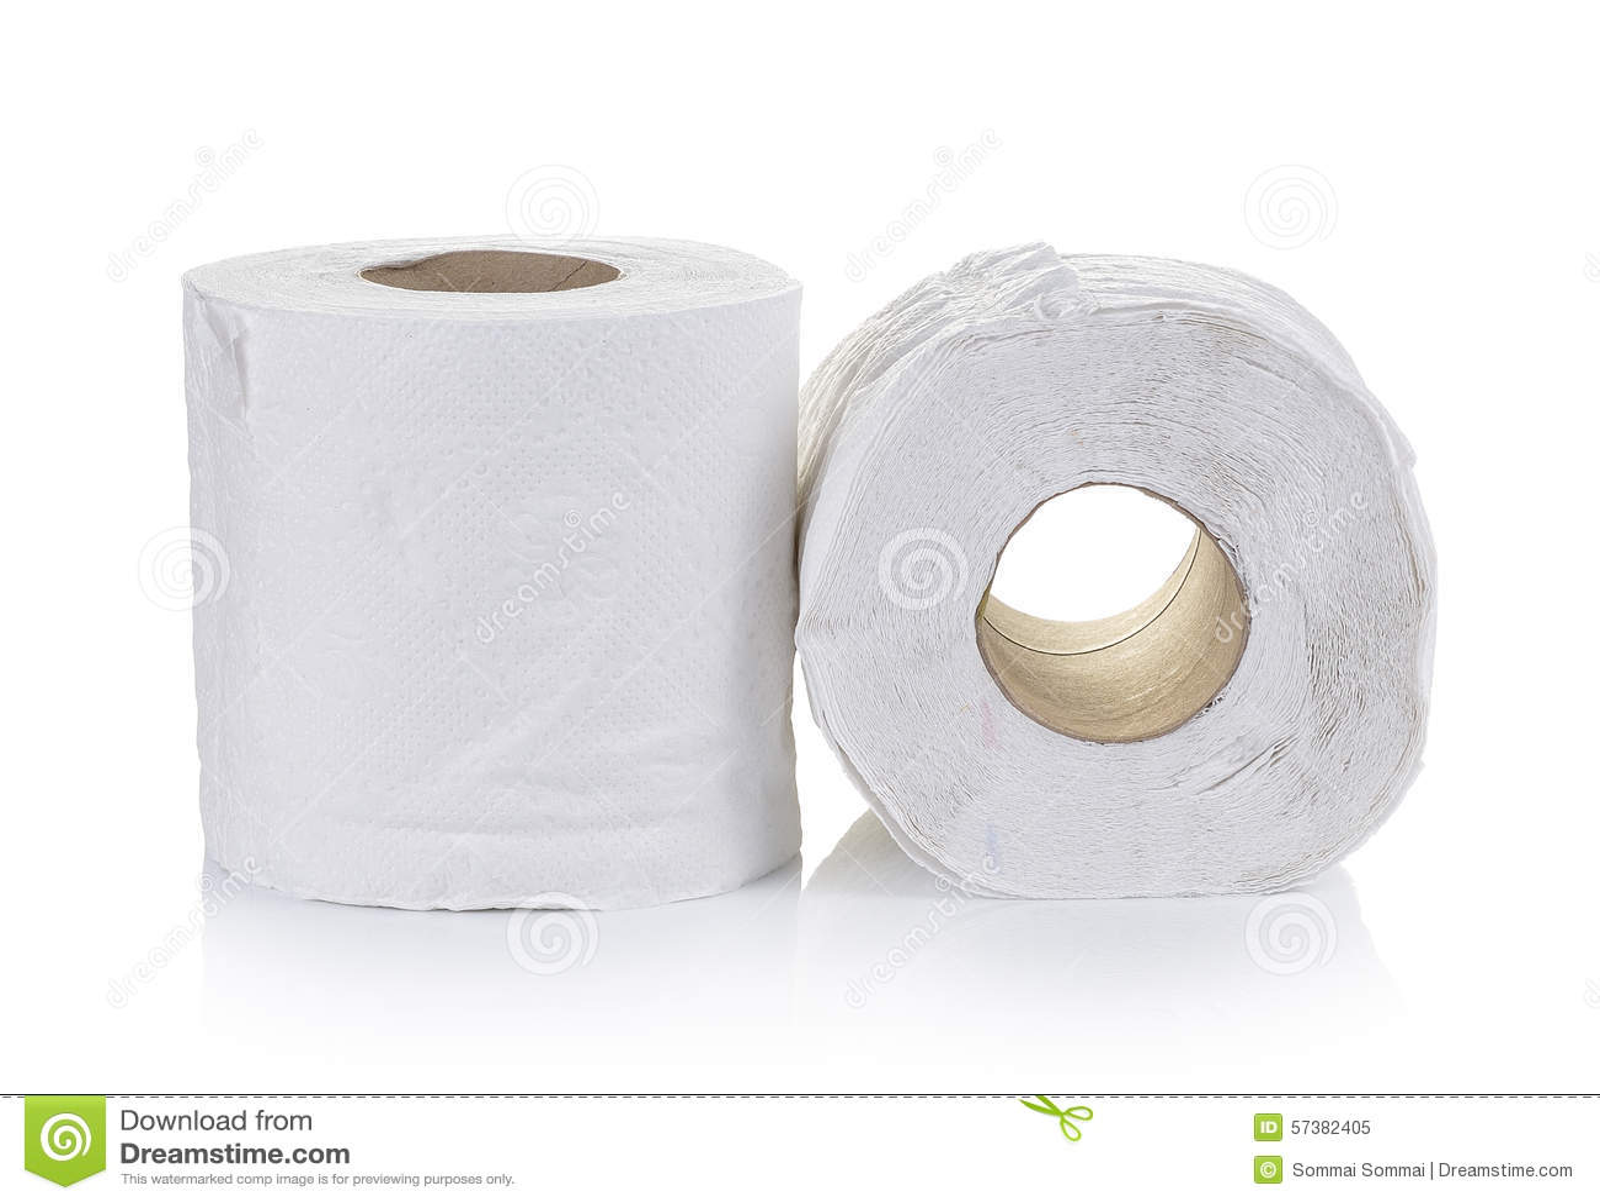 Toiletpapier op witte achtergrond